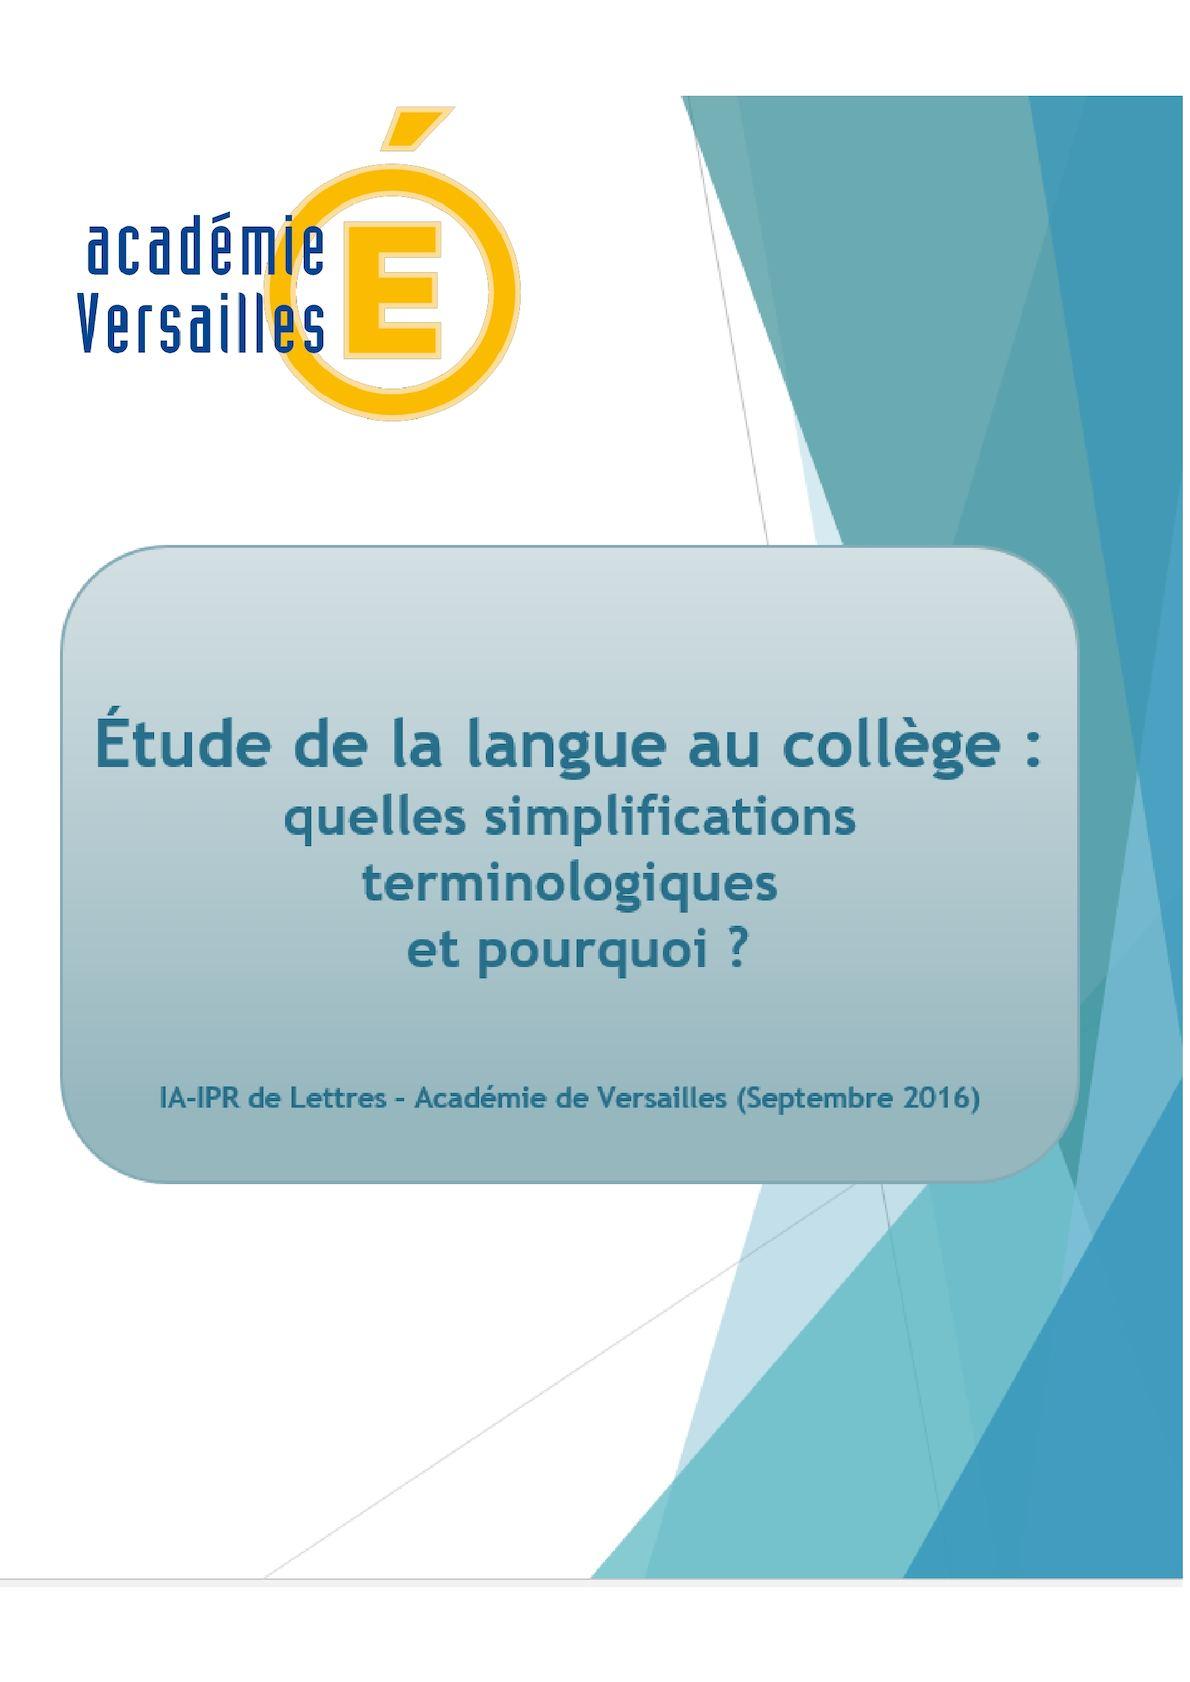 Etude De La Langue Simplifications Terminologiques